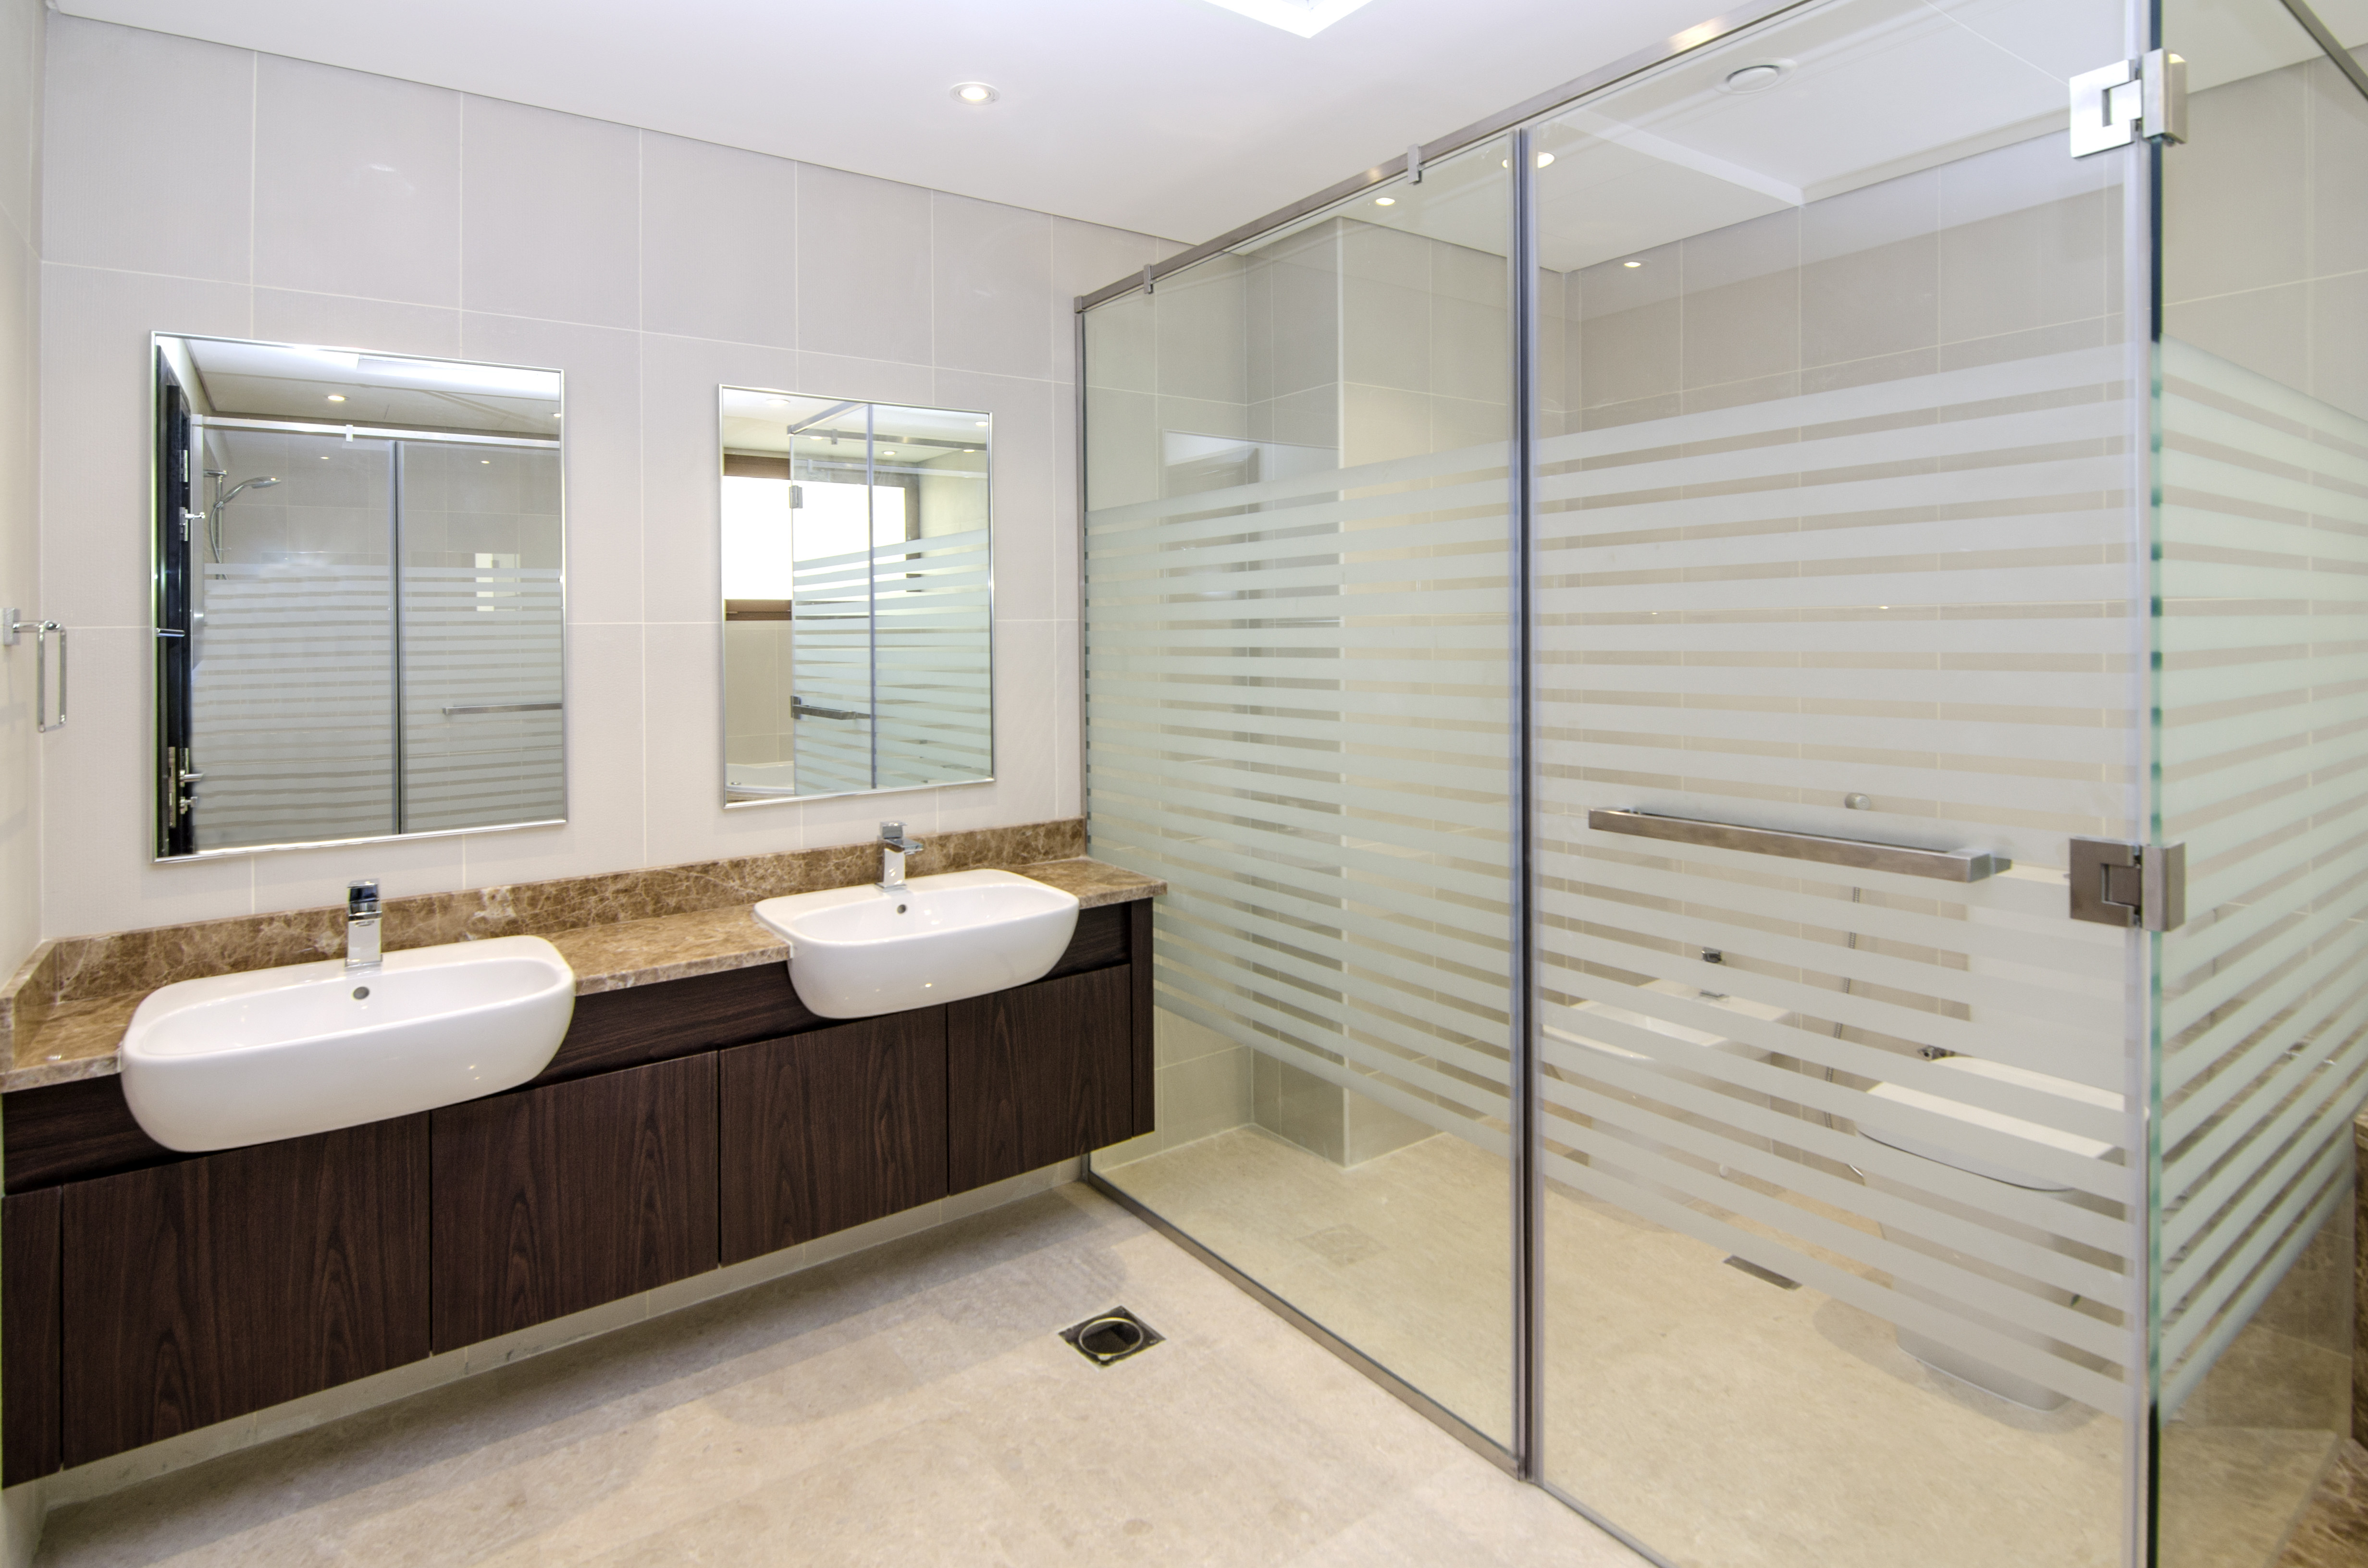 Modern Independent | 6 Bedroom Villa | Grand View